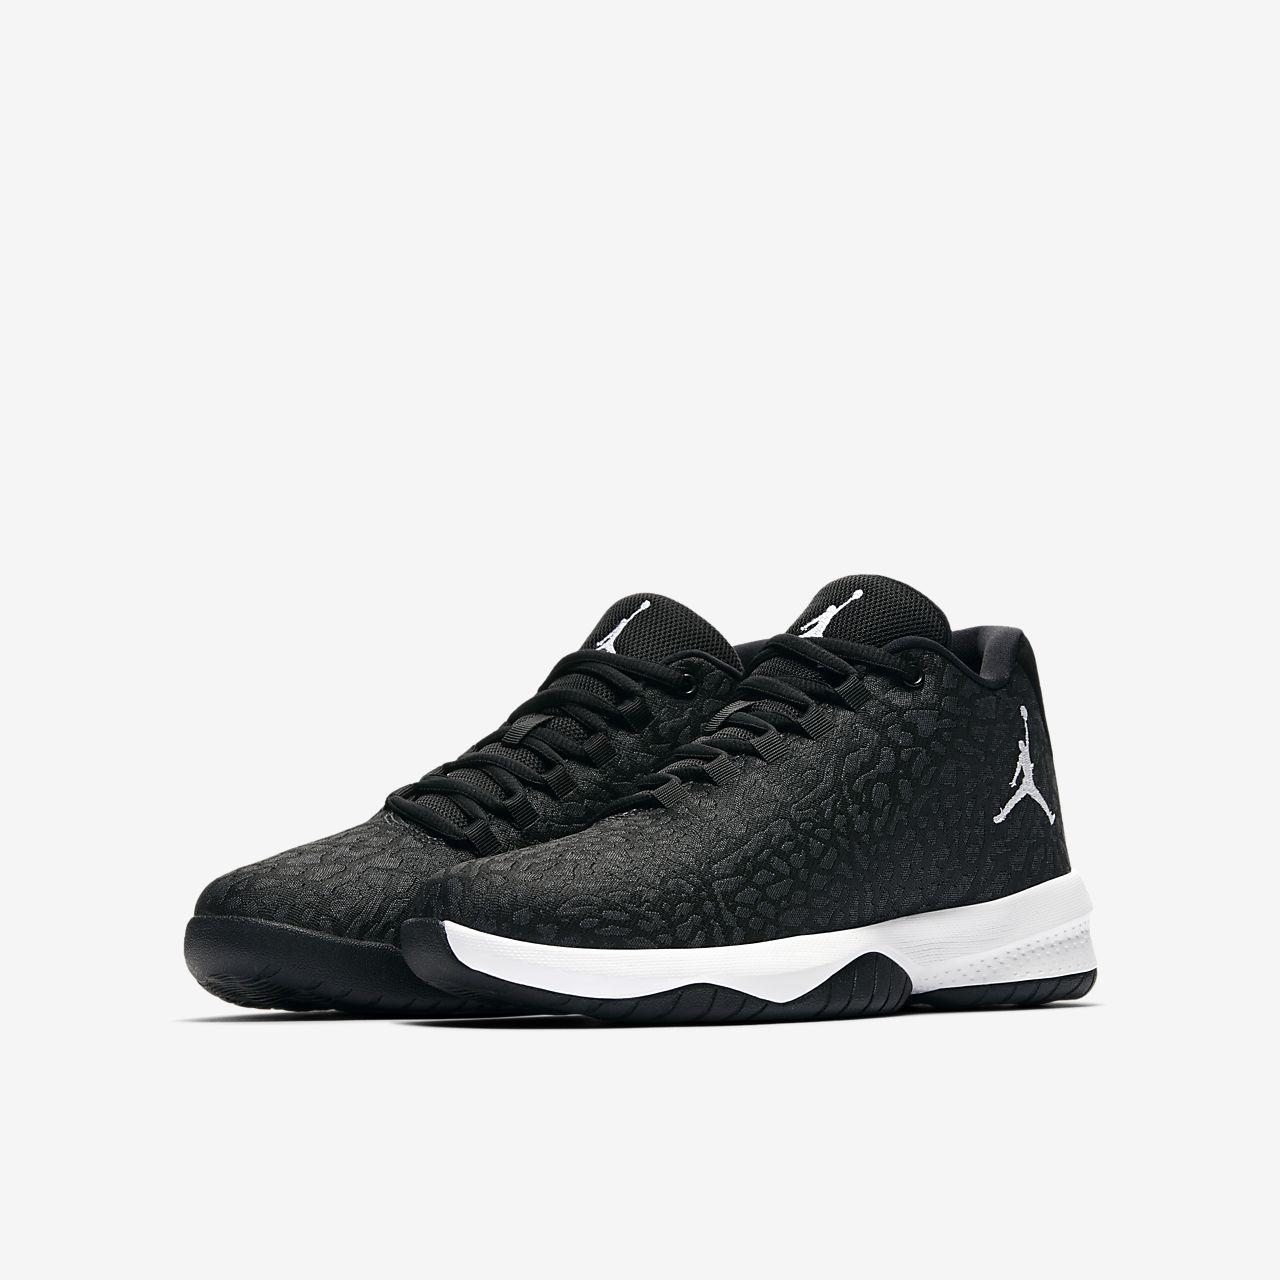 new arrival 2b8a3 8d839 nike jordan b fly bambini. Nike Jordan B. Fly BG, Scarpe da Basket ...